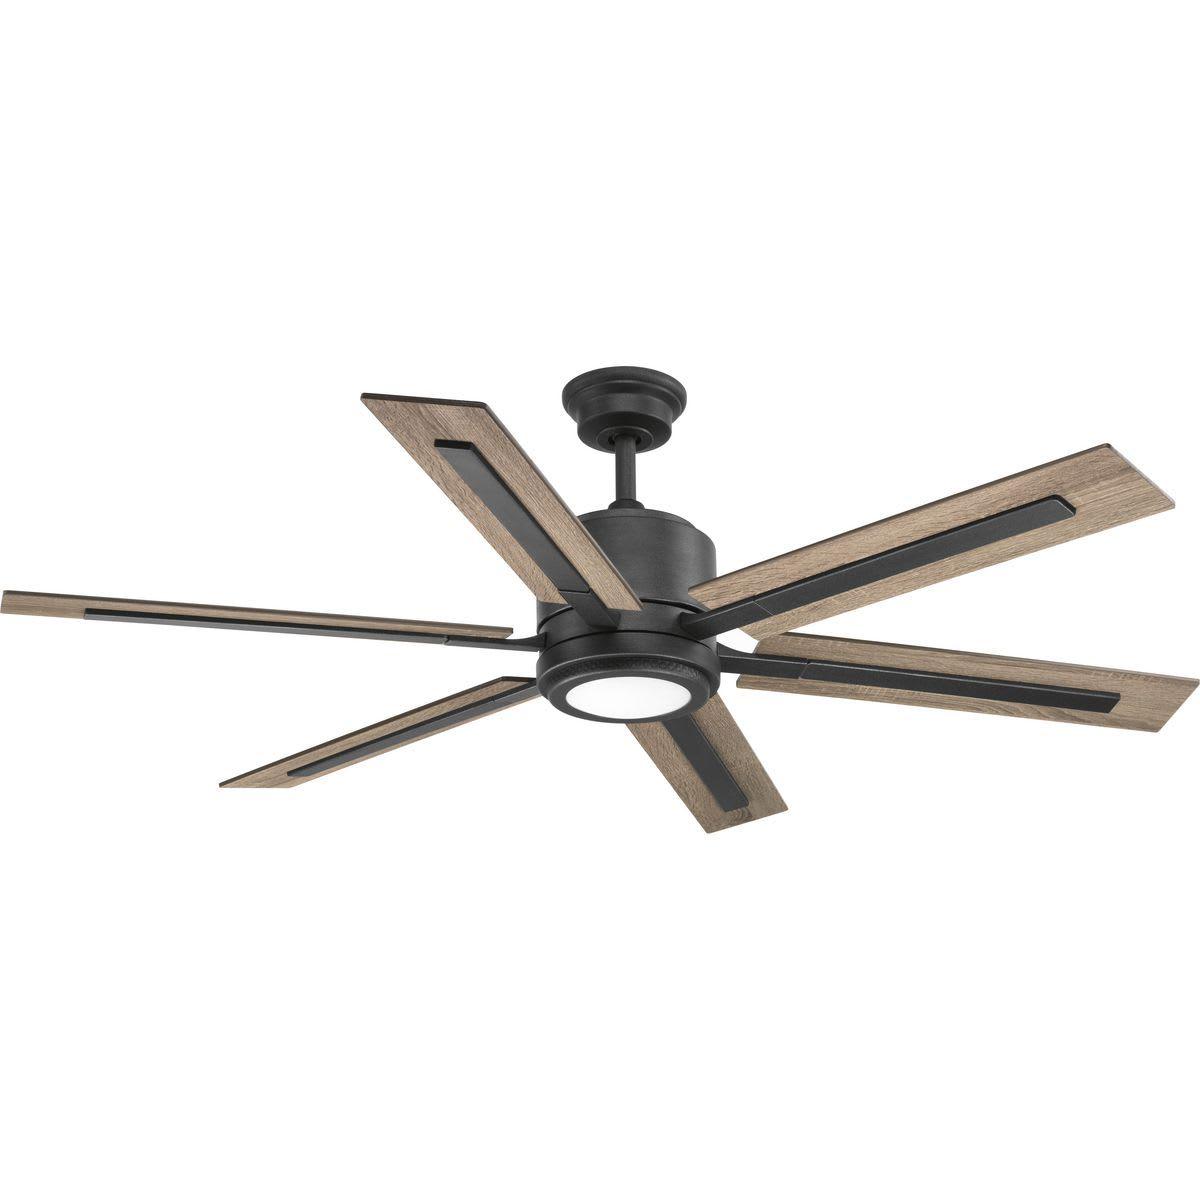 Progress Lighting Glandon 60 Build Com Ceiling Fan With Light Ceiling Fan With Remote Ceiling Fan